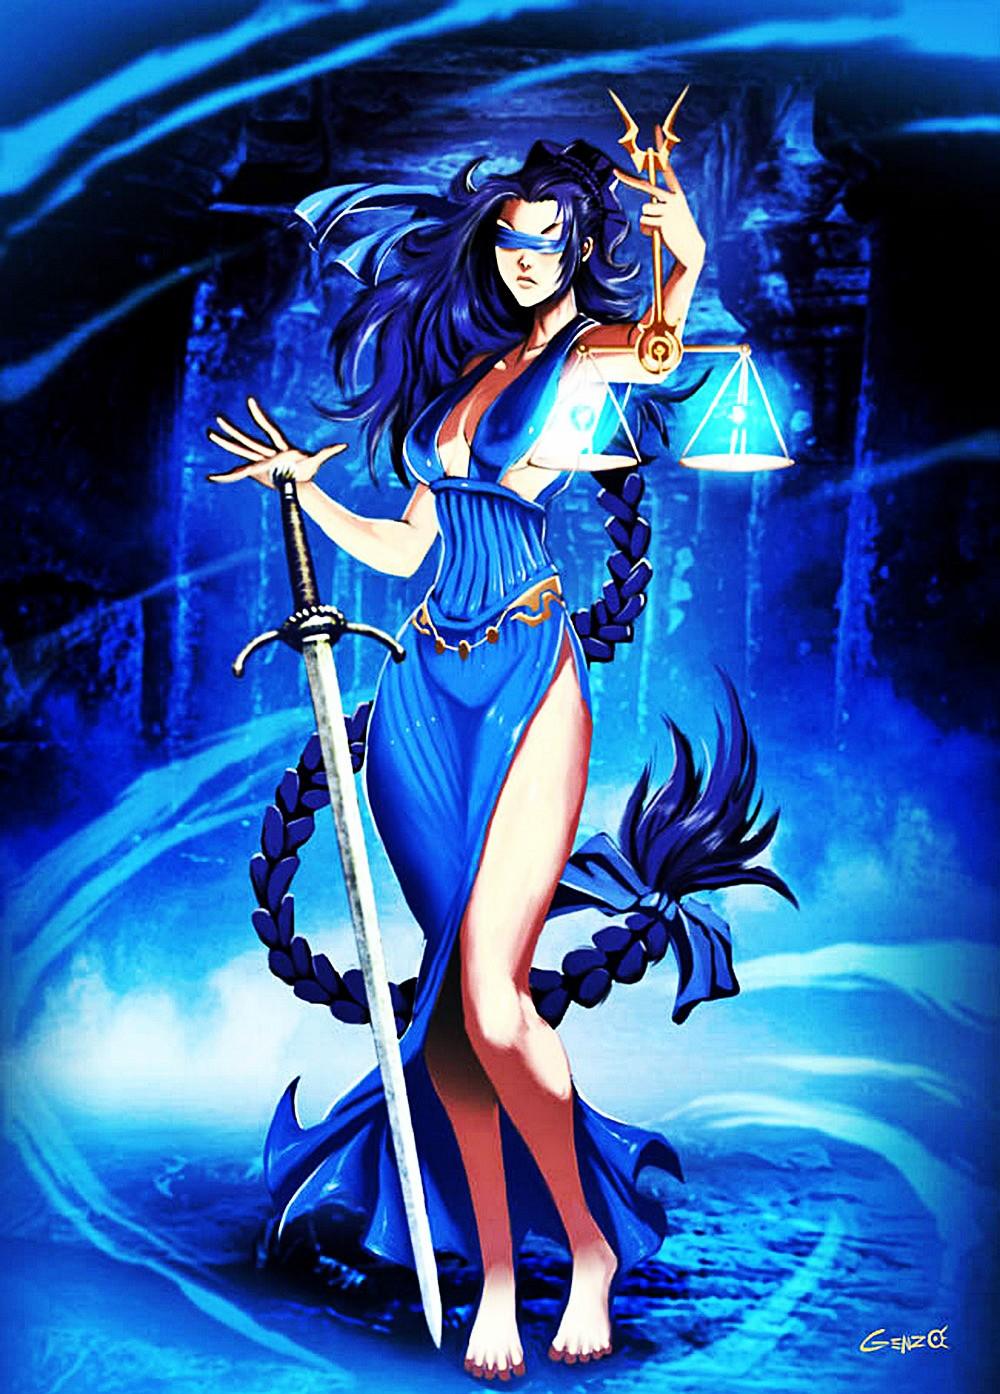 Free Download Deviantart Fantasy Wallpaper 1000x1394